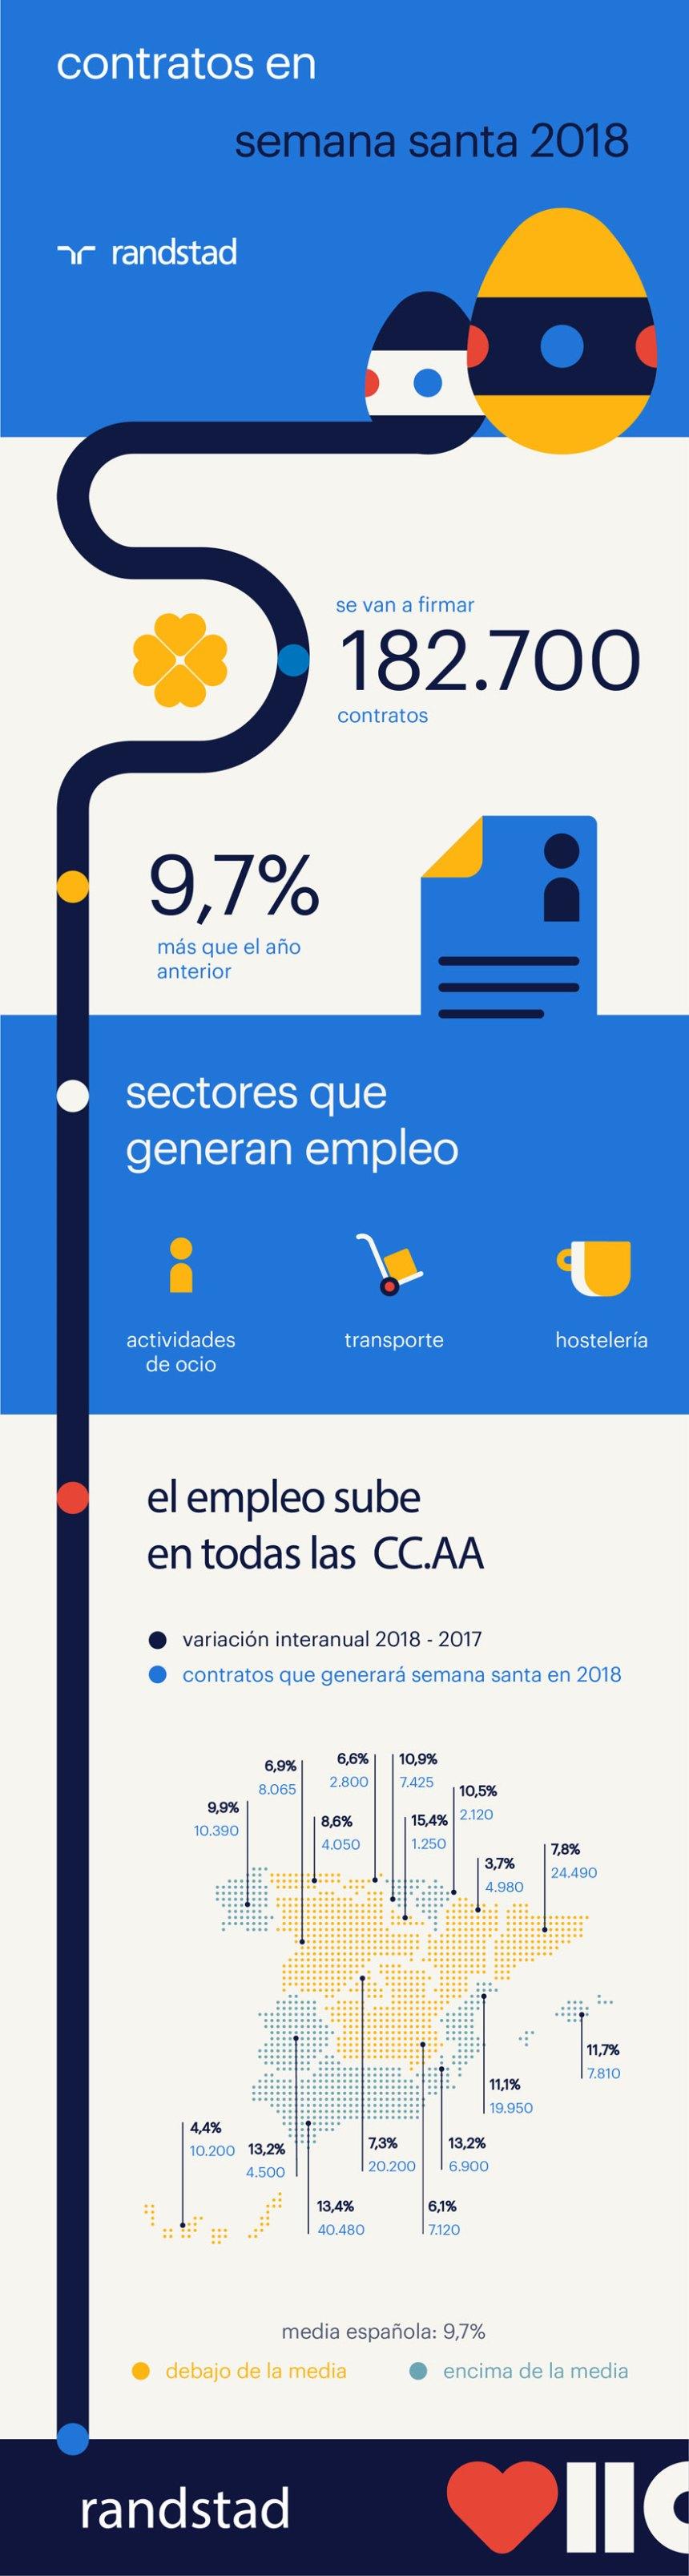 Previsión de contratos de trabajo en Semana Santa en España